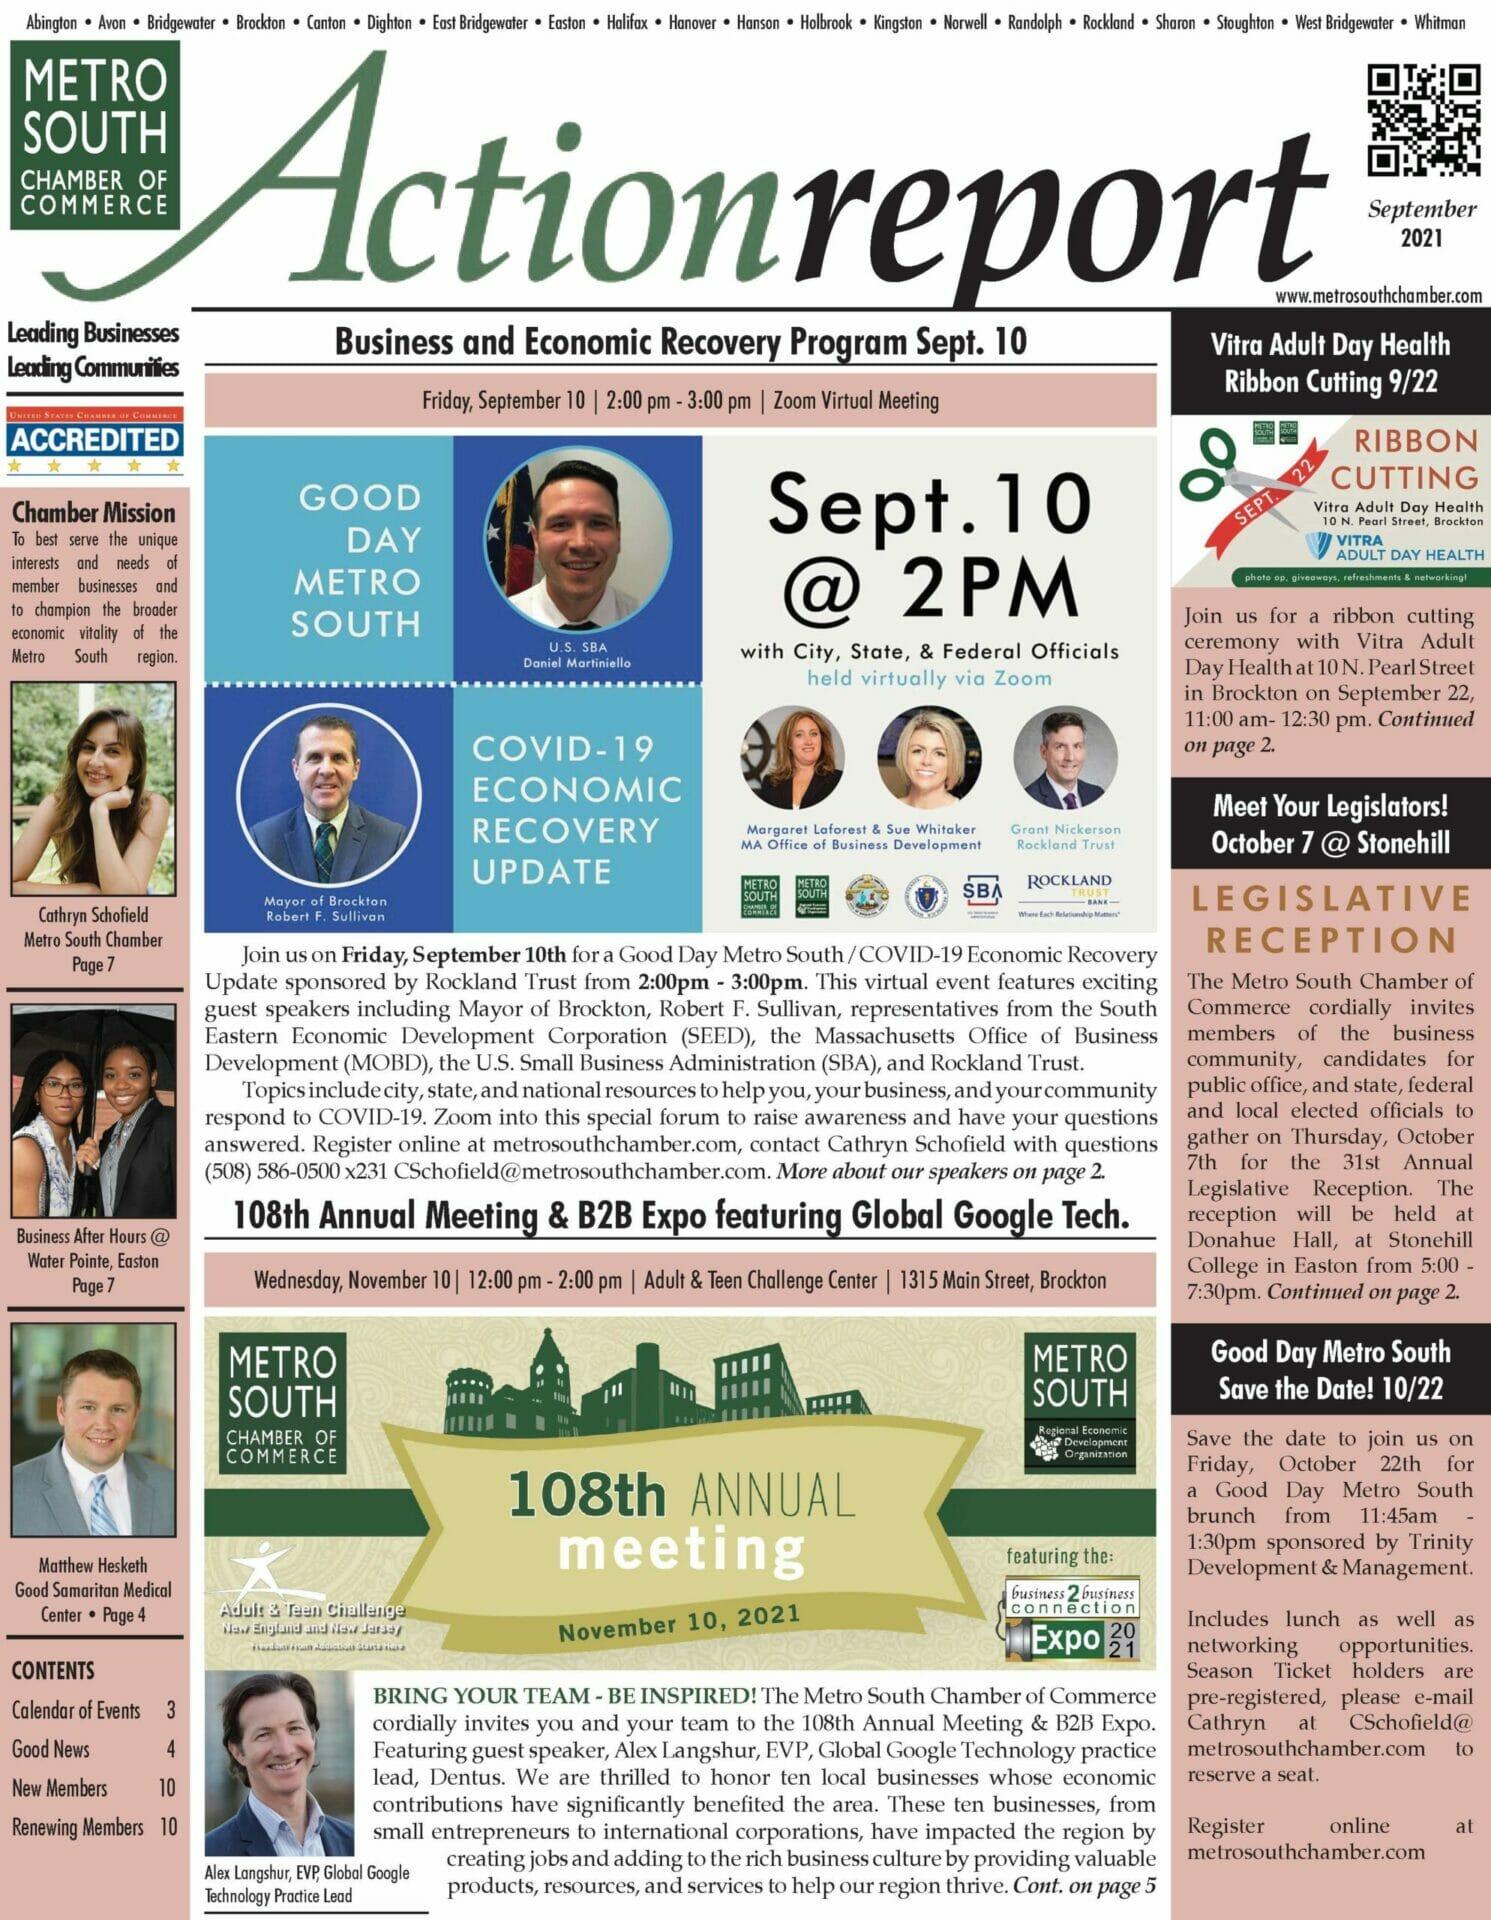 september 2021 action report newsletter front cover